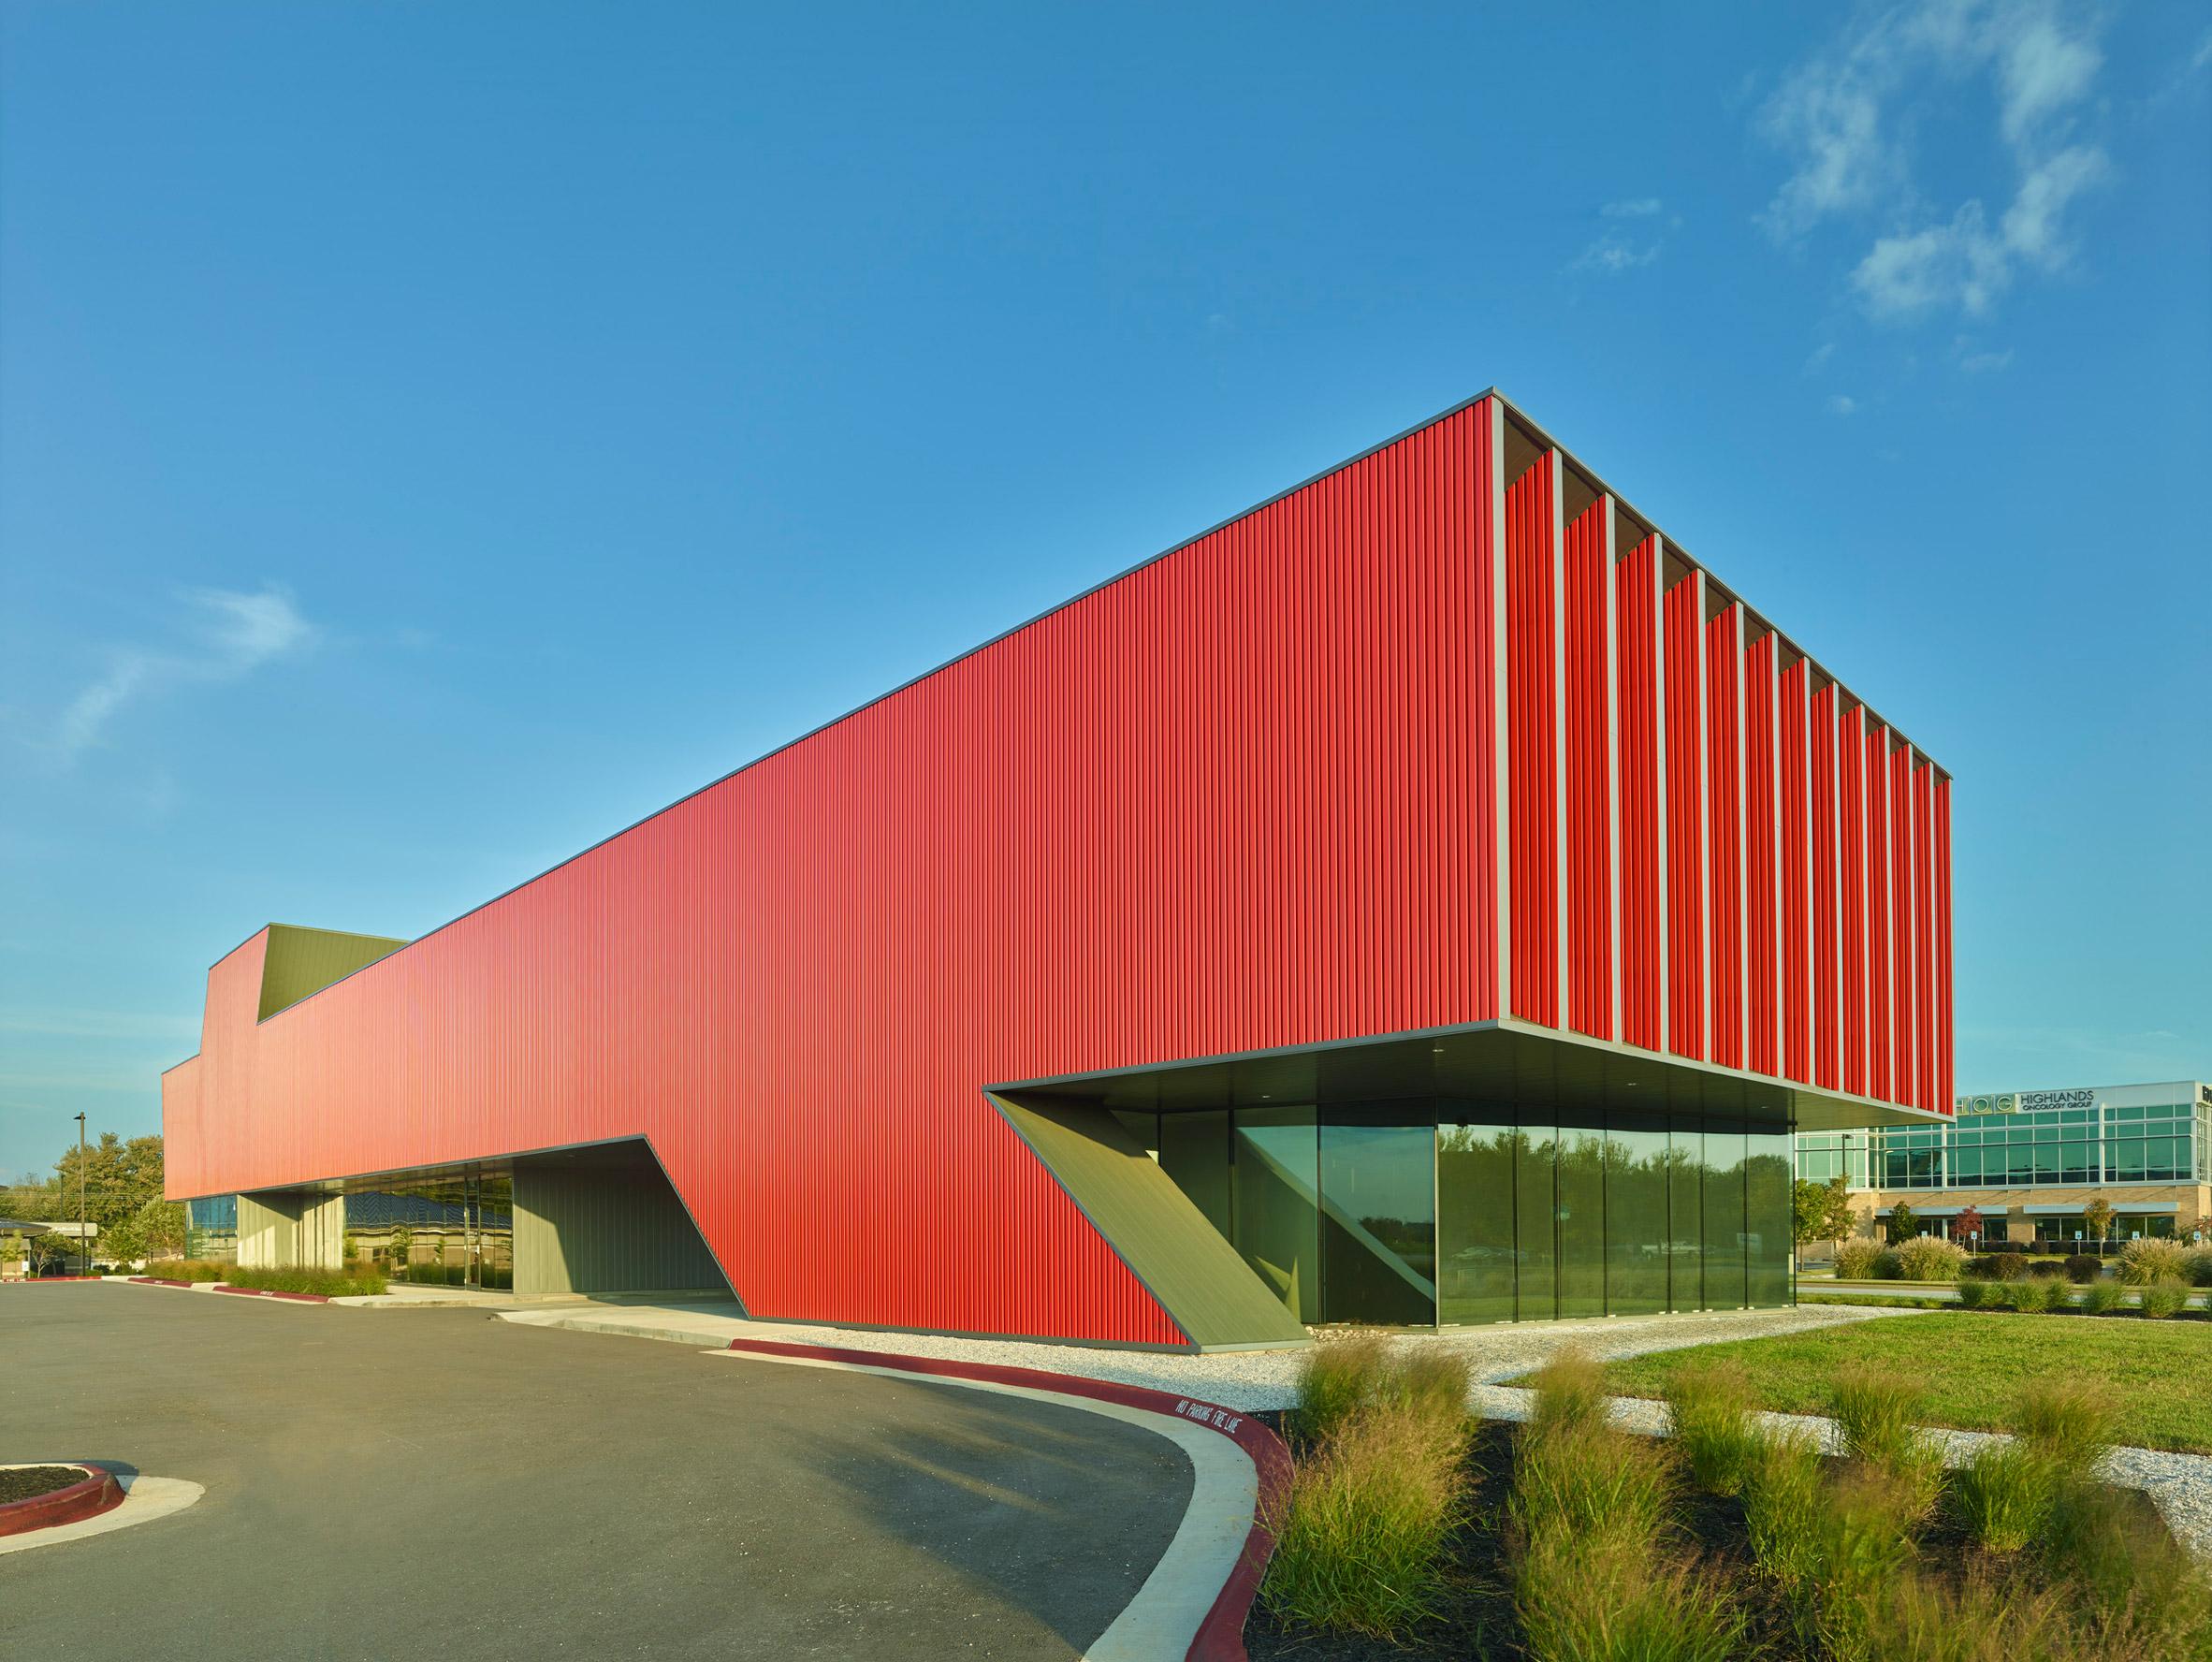 Marlon Blackwell creates Arkansas paediatric clinic with vivid red facade